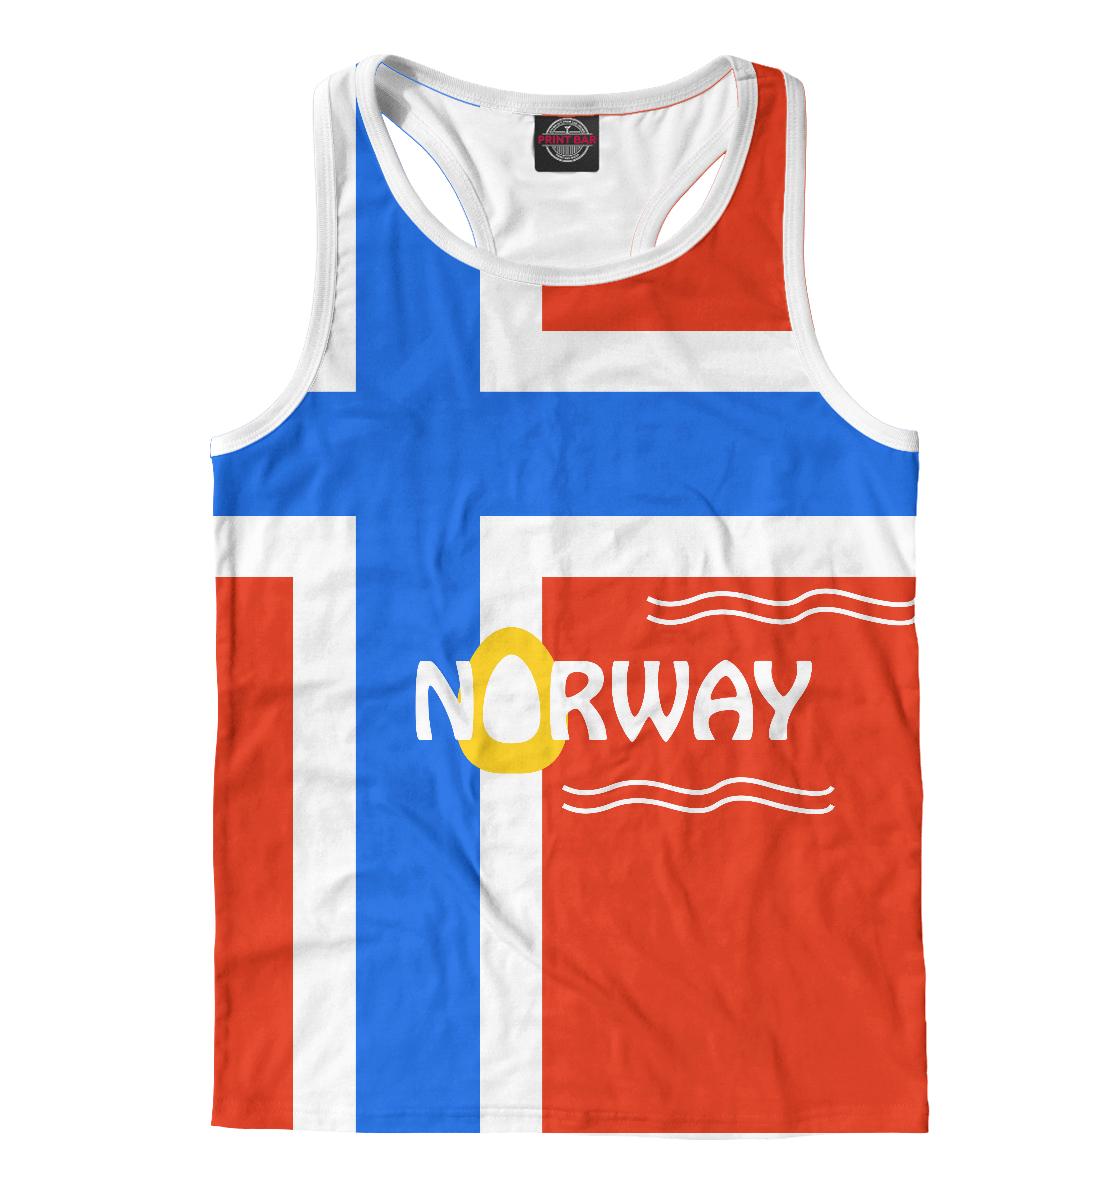 Купить Норвегия, Printbar, Майки борцовки, CTS-292150-mayb-2